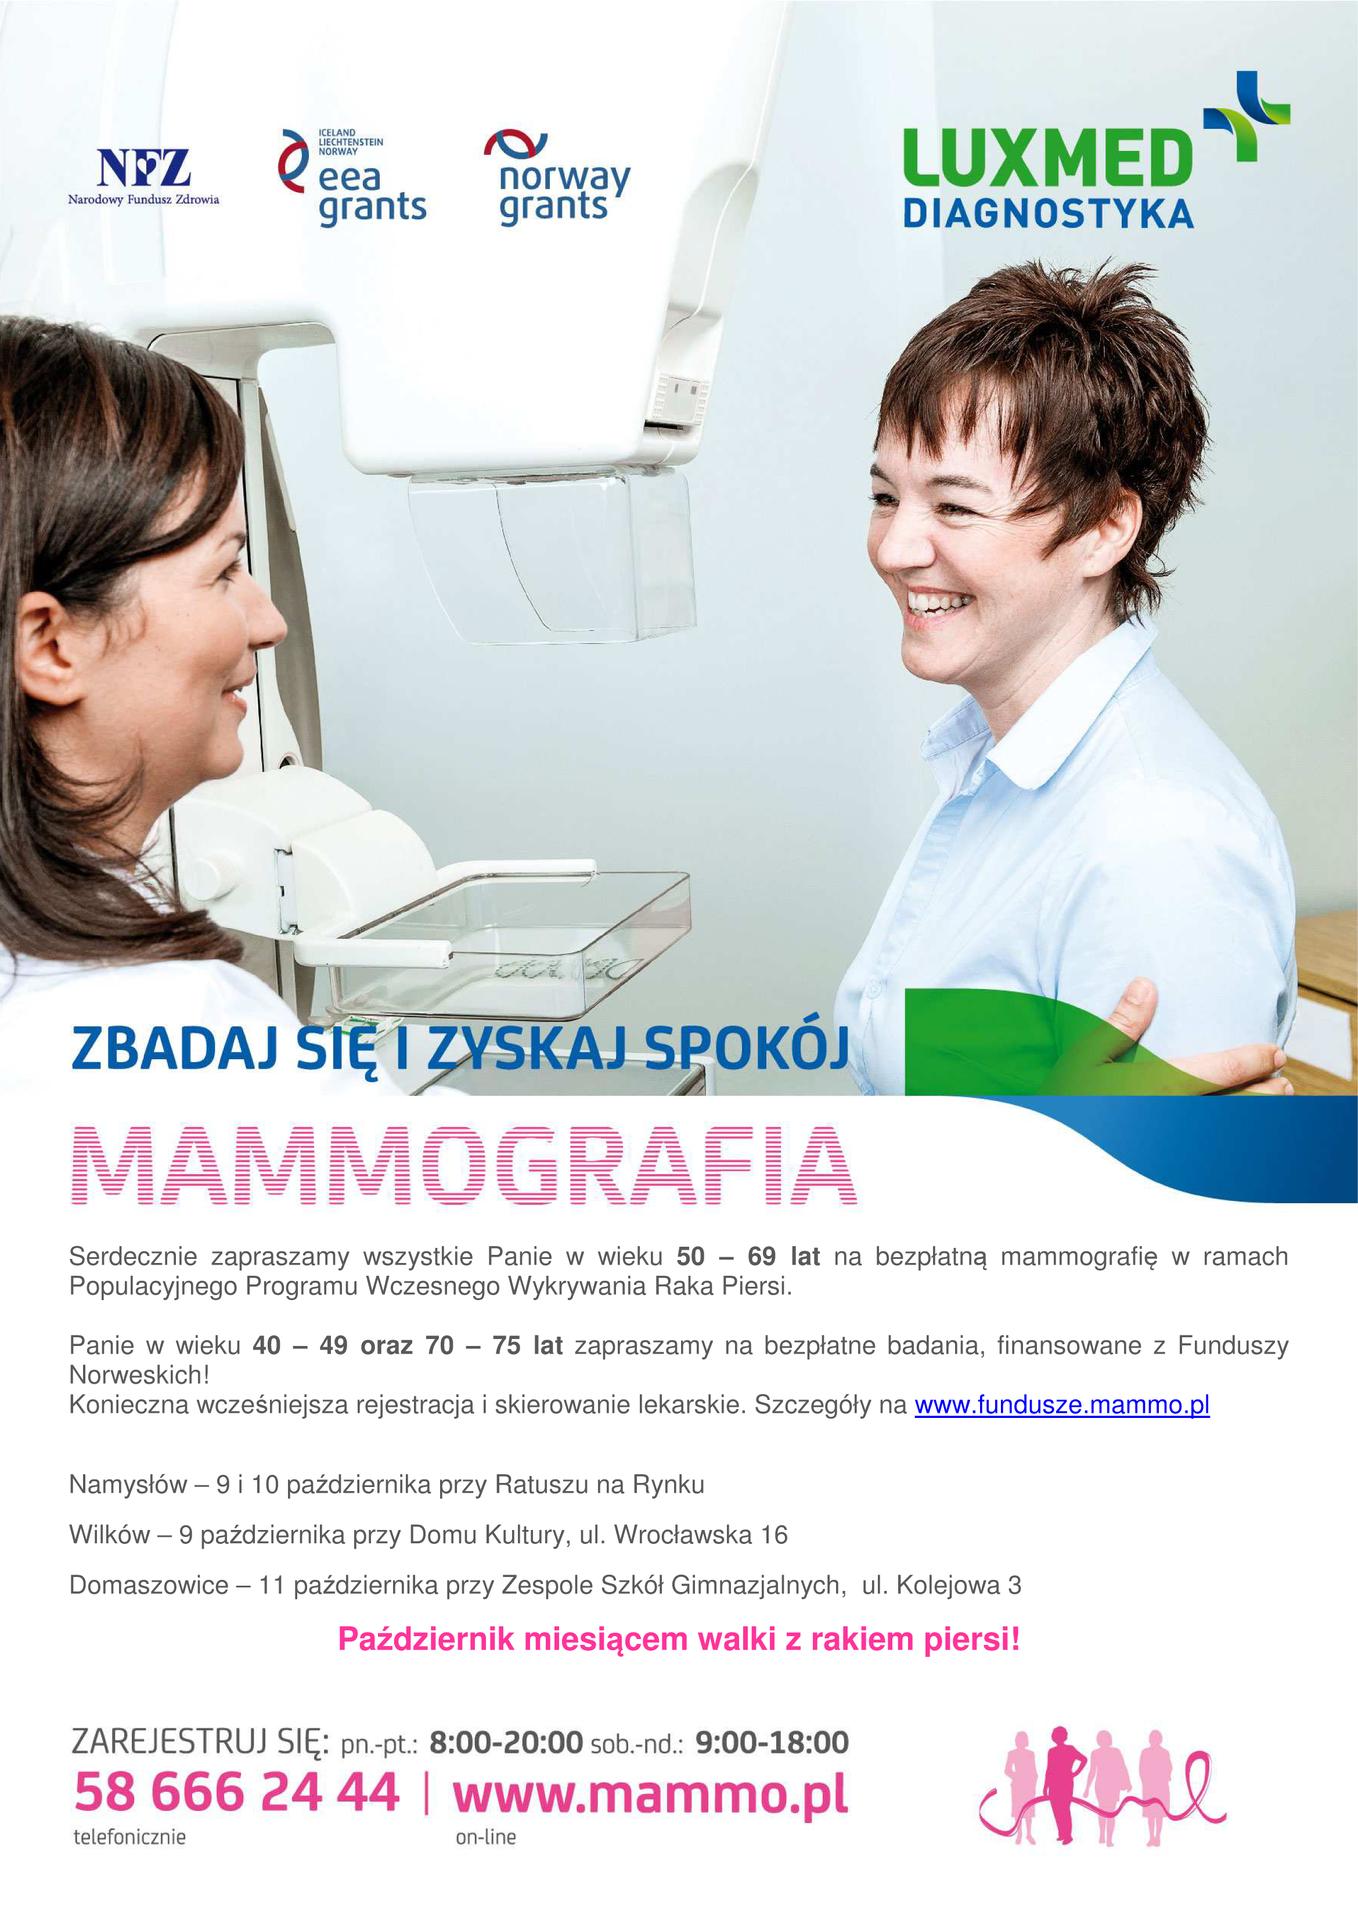 8.26e._mammografia_-_plakat_wersja_elektroniczna_A3-1.jpeg